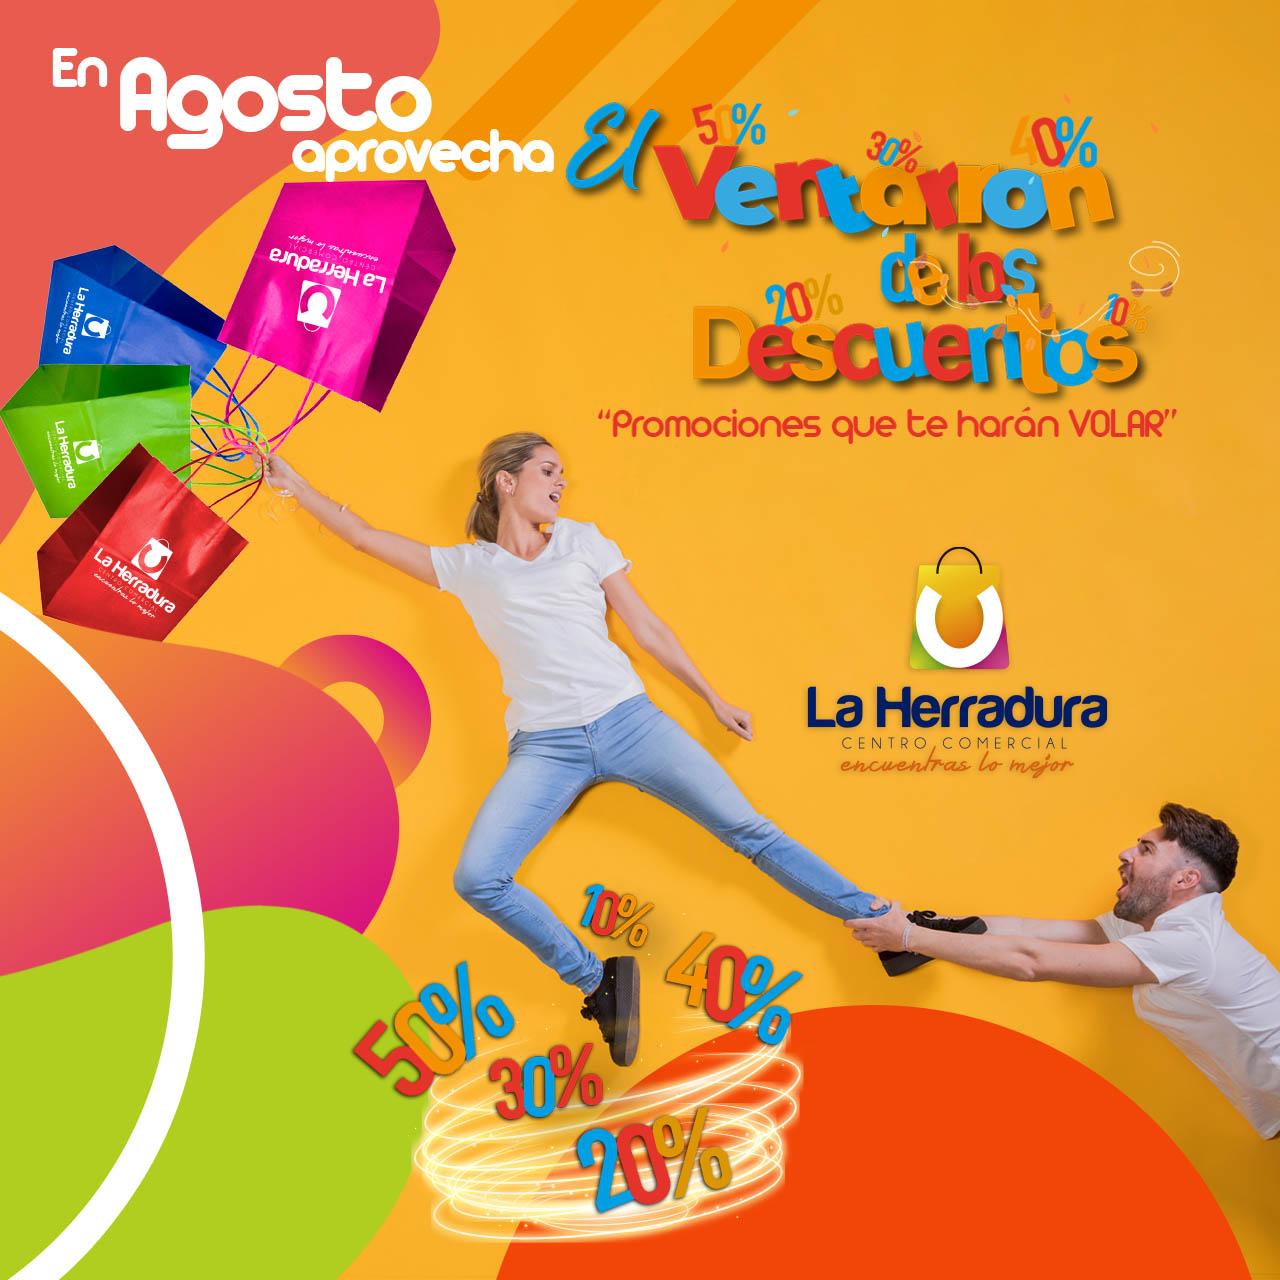 https://laherradura.com.co/wp-content/uploads/2020/11/evento-2-1.jpg